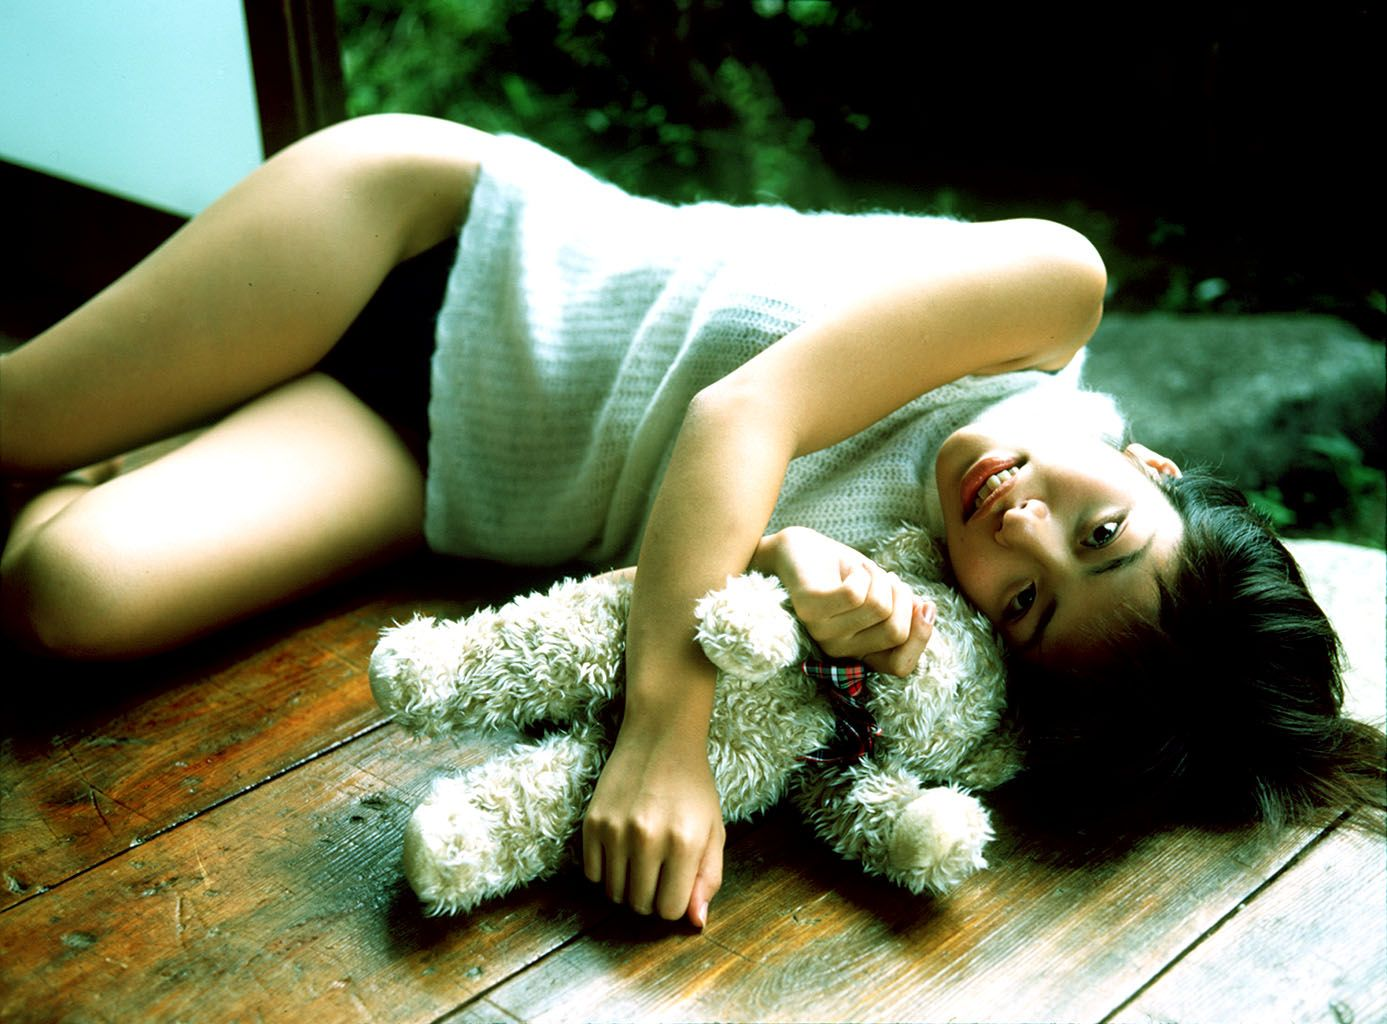 [N/S Eyes] 2000.02.08 SF No.045 Sara Matsuzaka 松坂紗良 [15P1MB] 02la-jpg